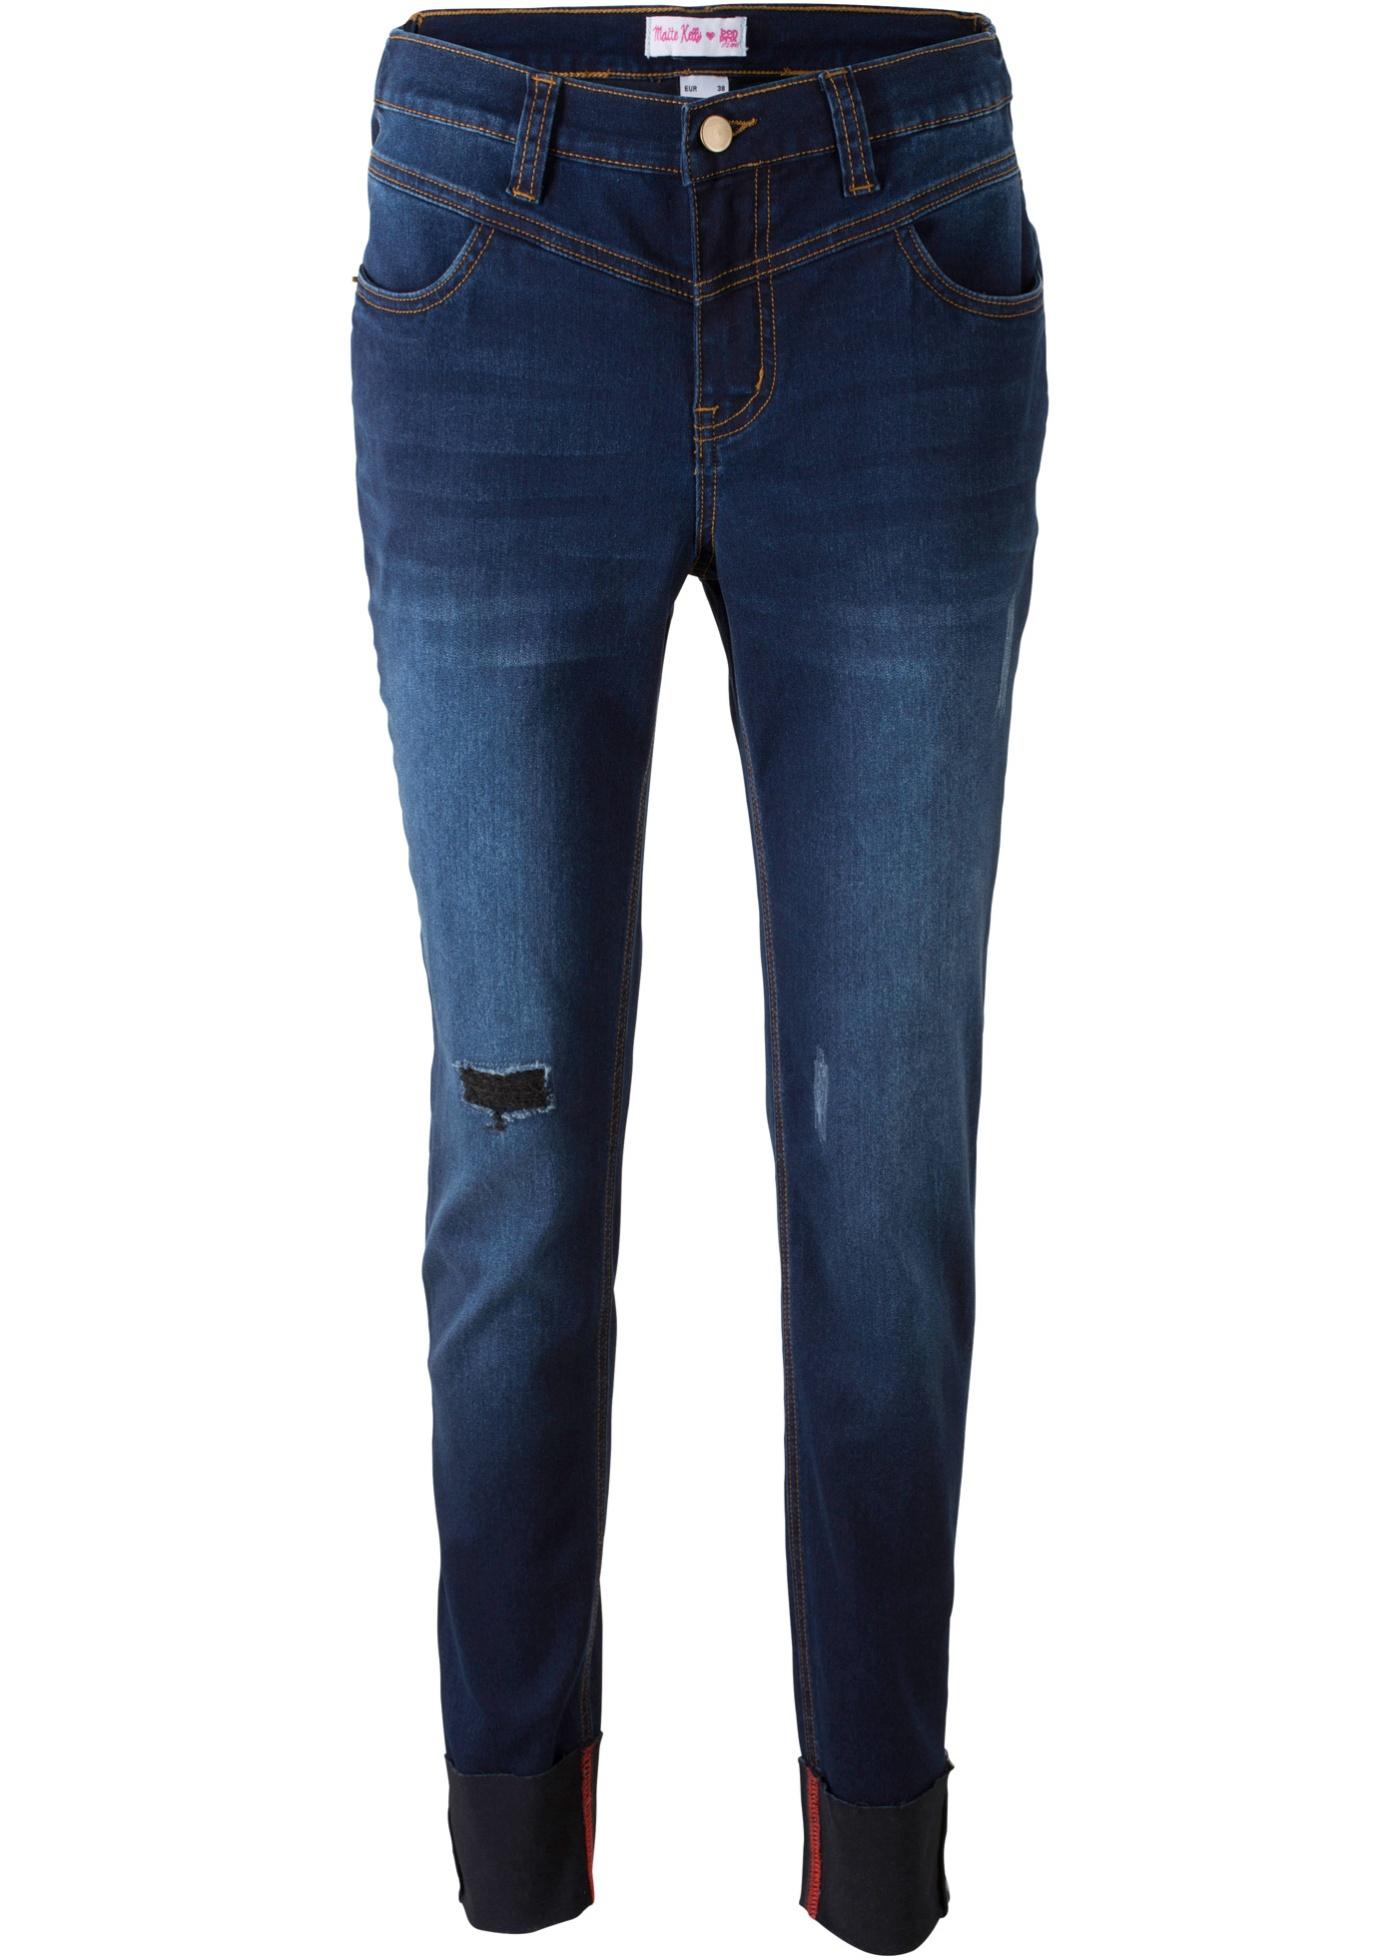 Bonprix SE - Moderiktigt uppvikta jeans – designade av Maite Kelly 349.00